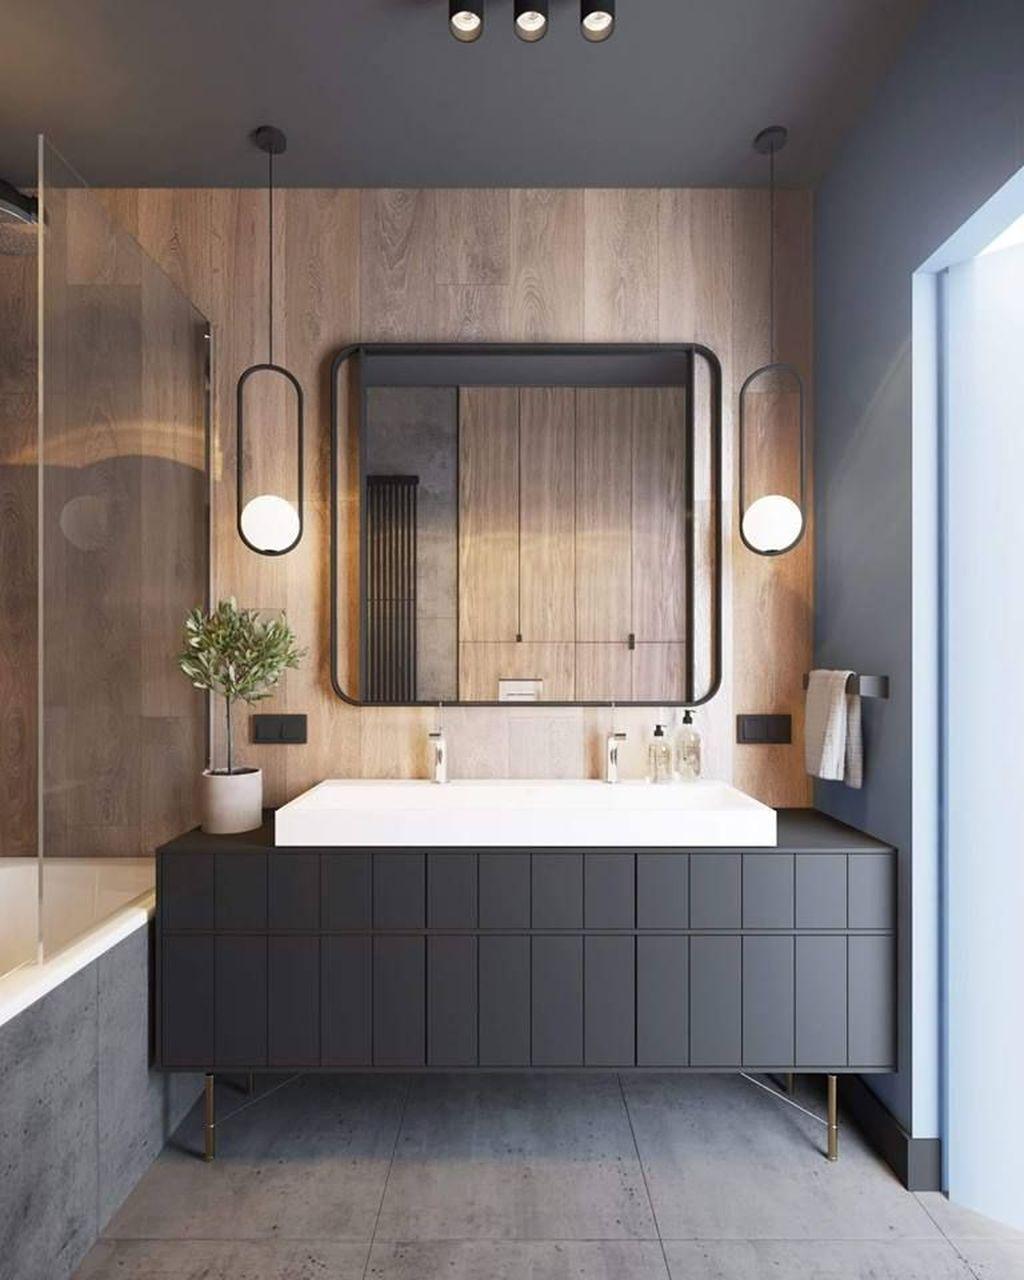 Small Bathroom Vanity Ideas Small Bathroom Vanities Small Space Bathroom Bathroom Vanity